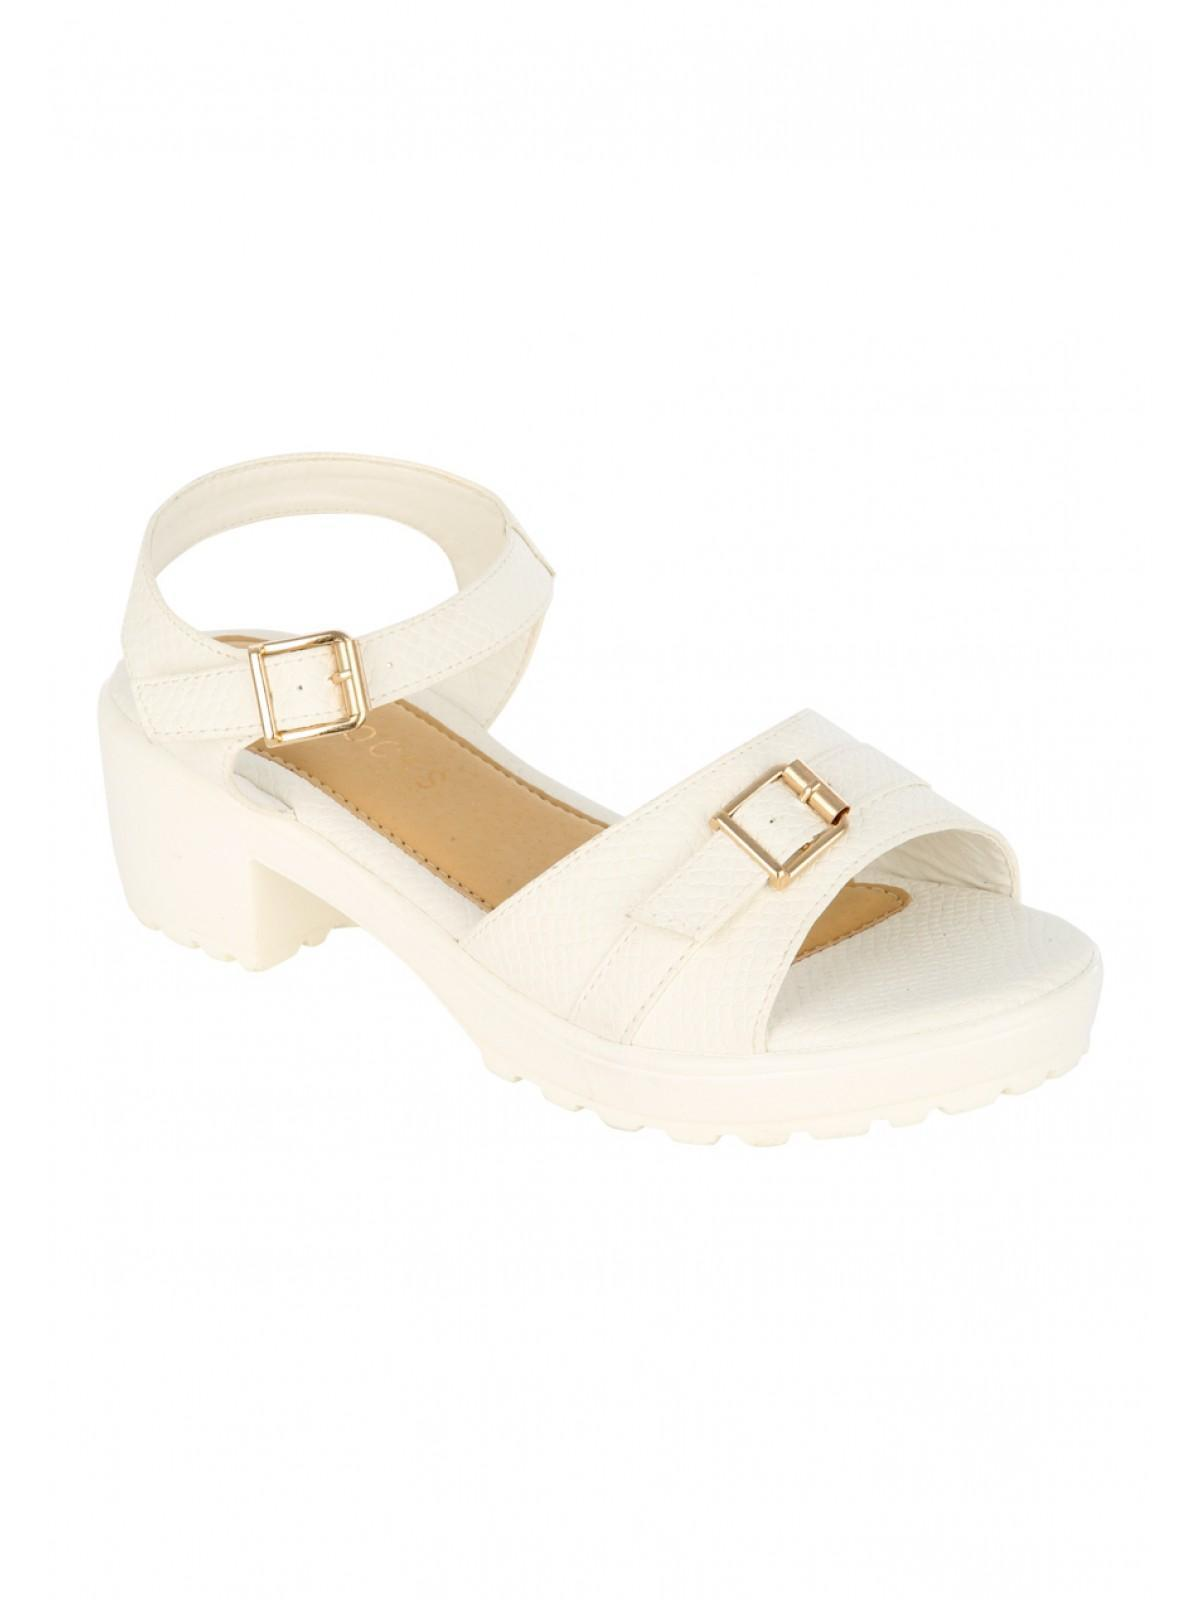 9c130c2ad94 ... White Block Heel Sandals. Back. PreviousNext